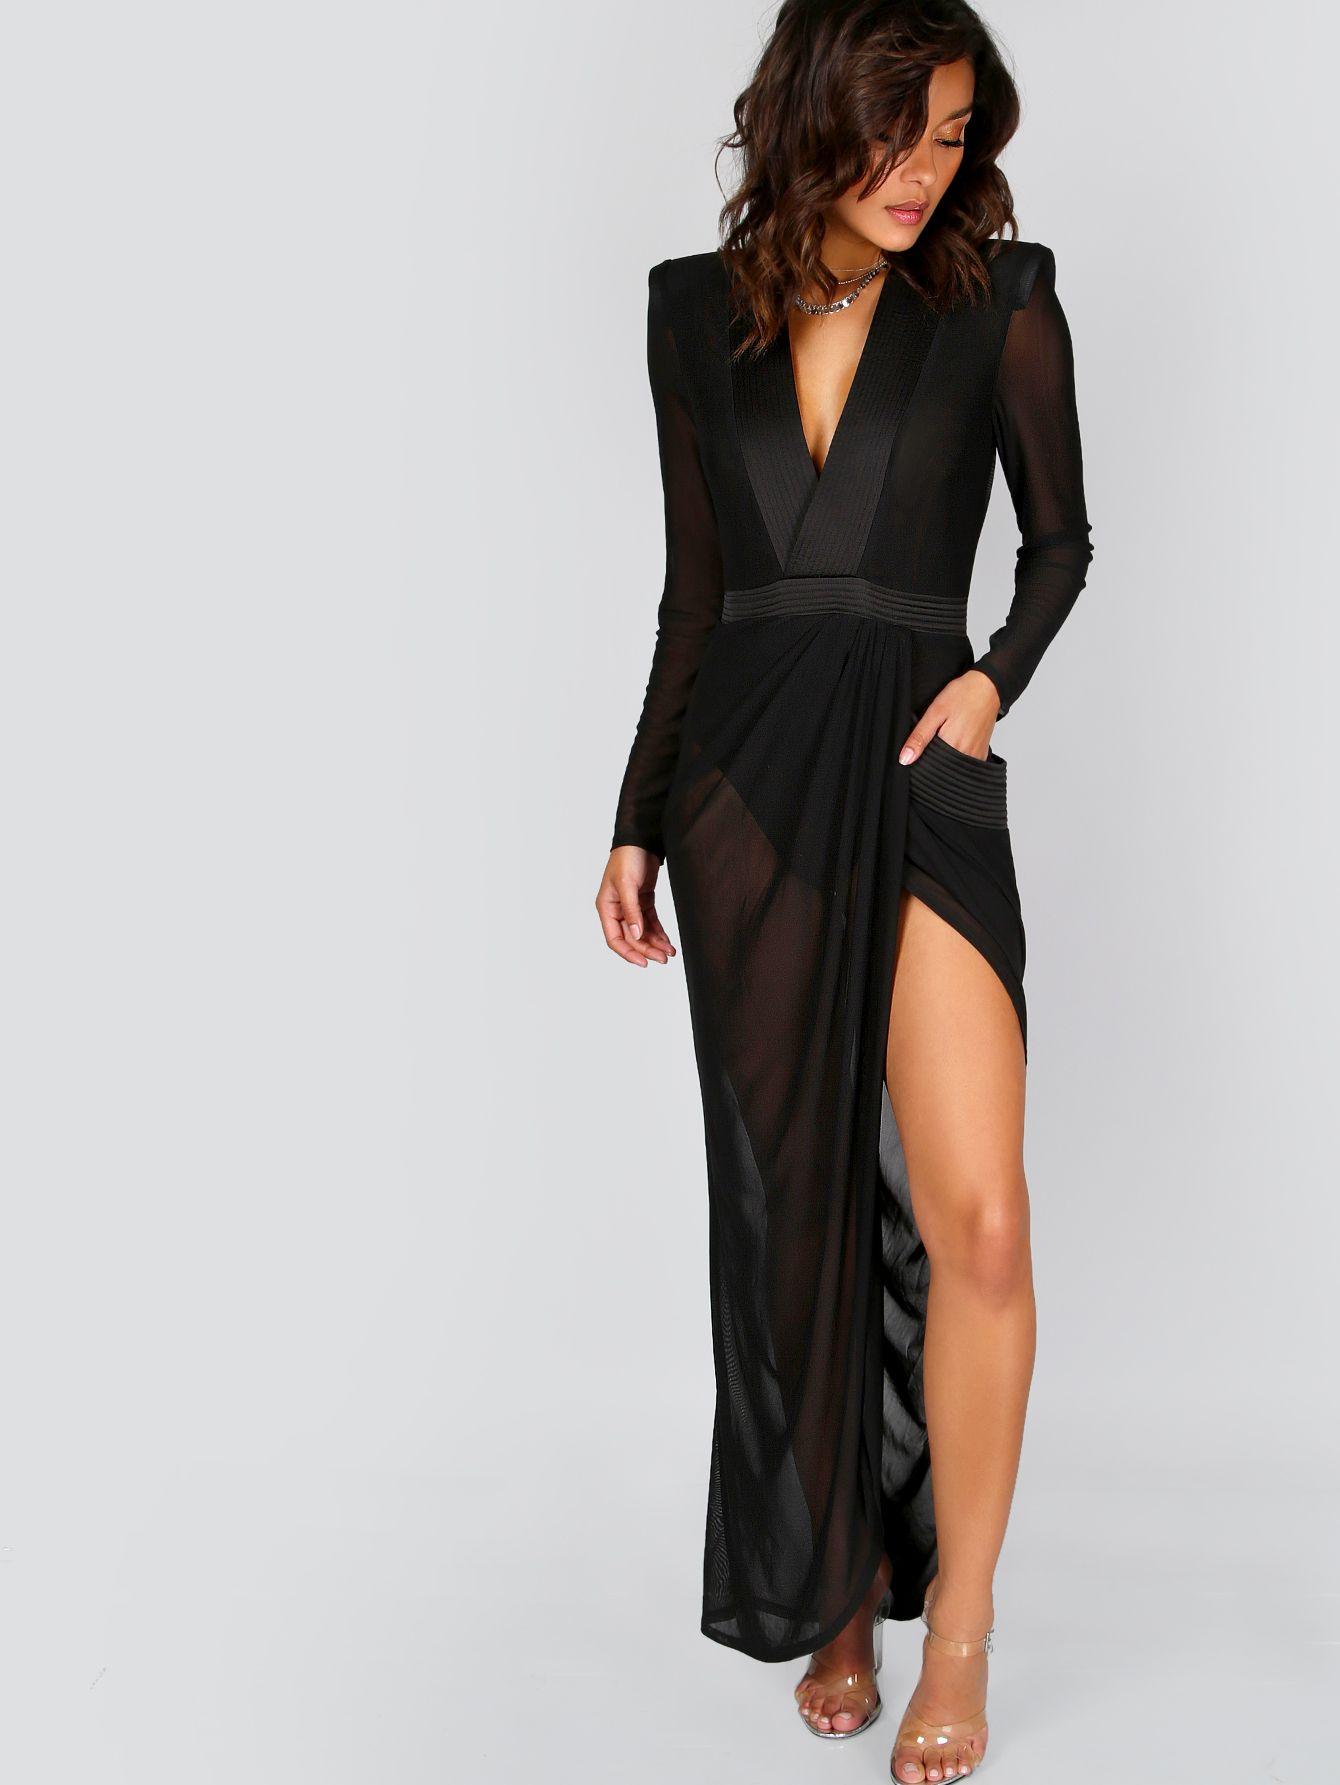 Deep V Neck Shoulder Pads Sheer Wrap Dress BLACK -SheIn(Sheinside ... 226b67305